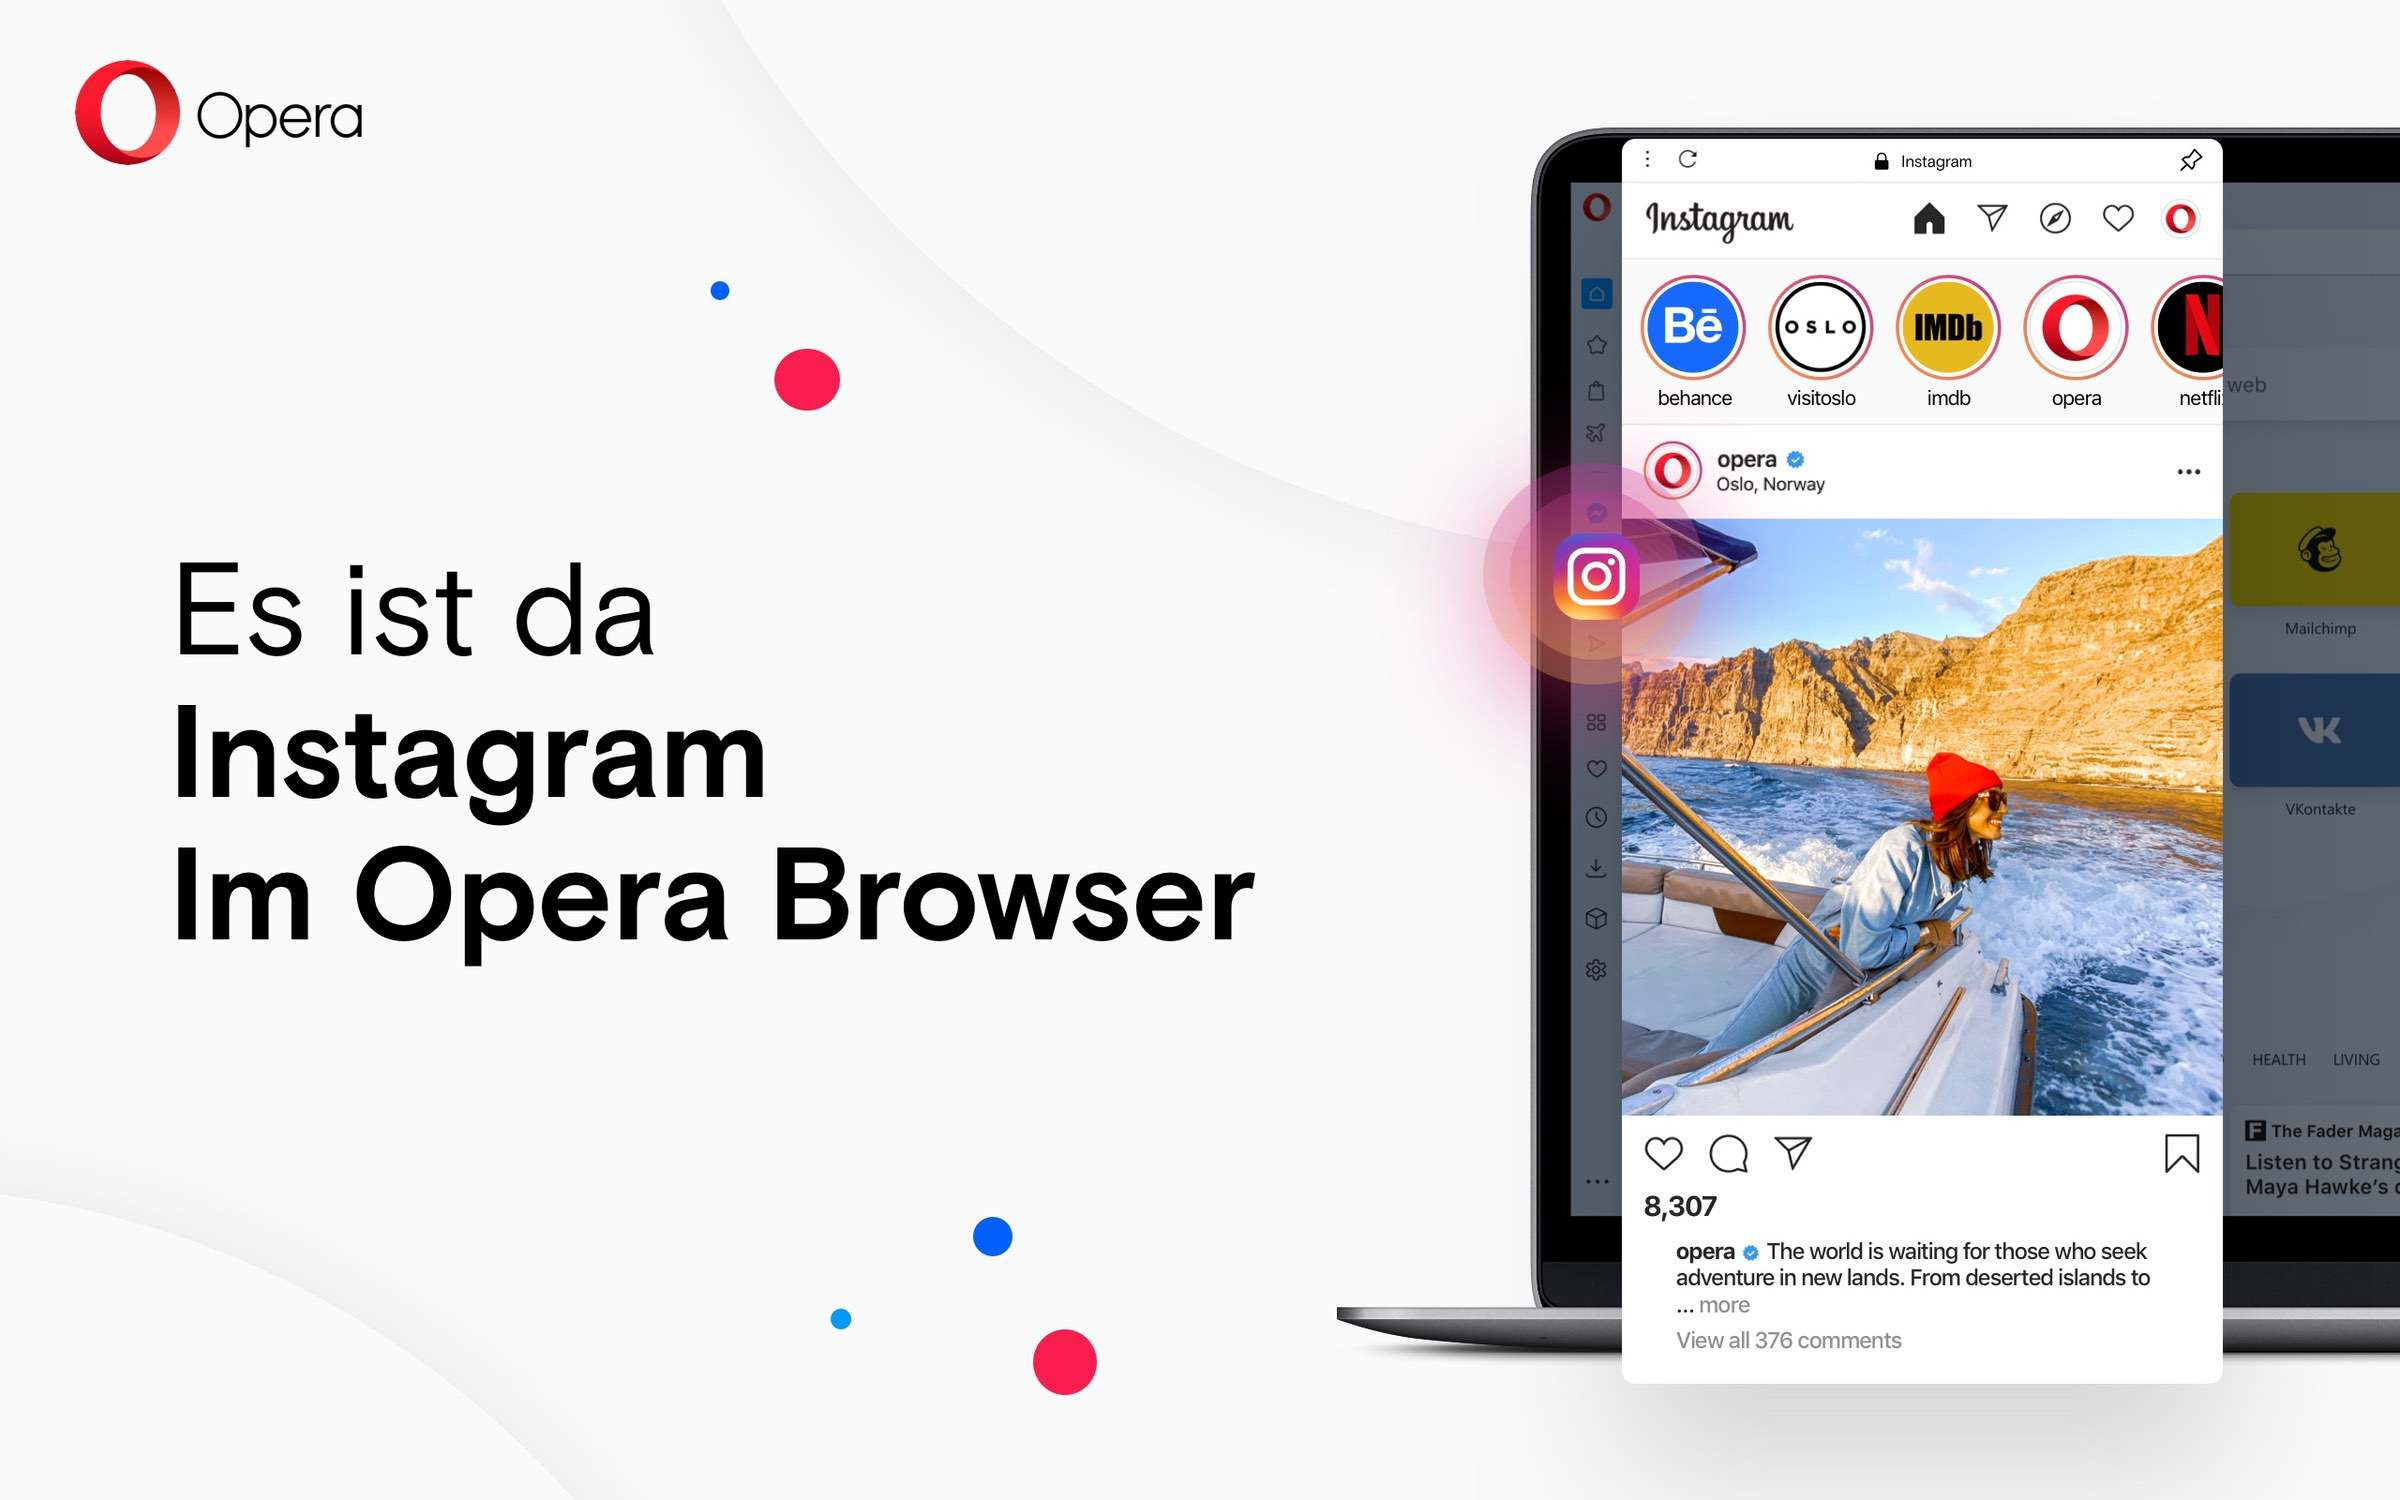 Opera bringt Instagram auf den Desktop